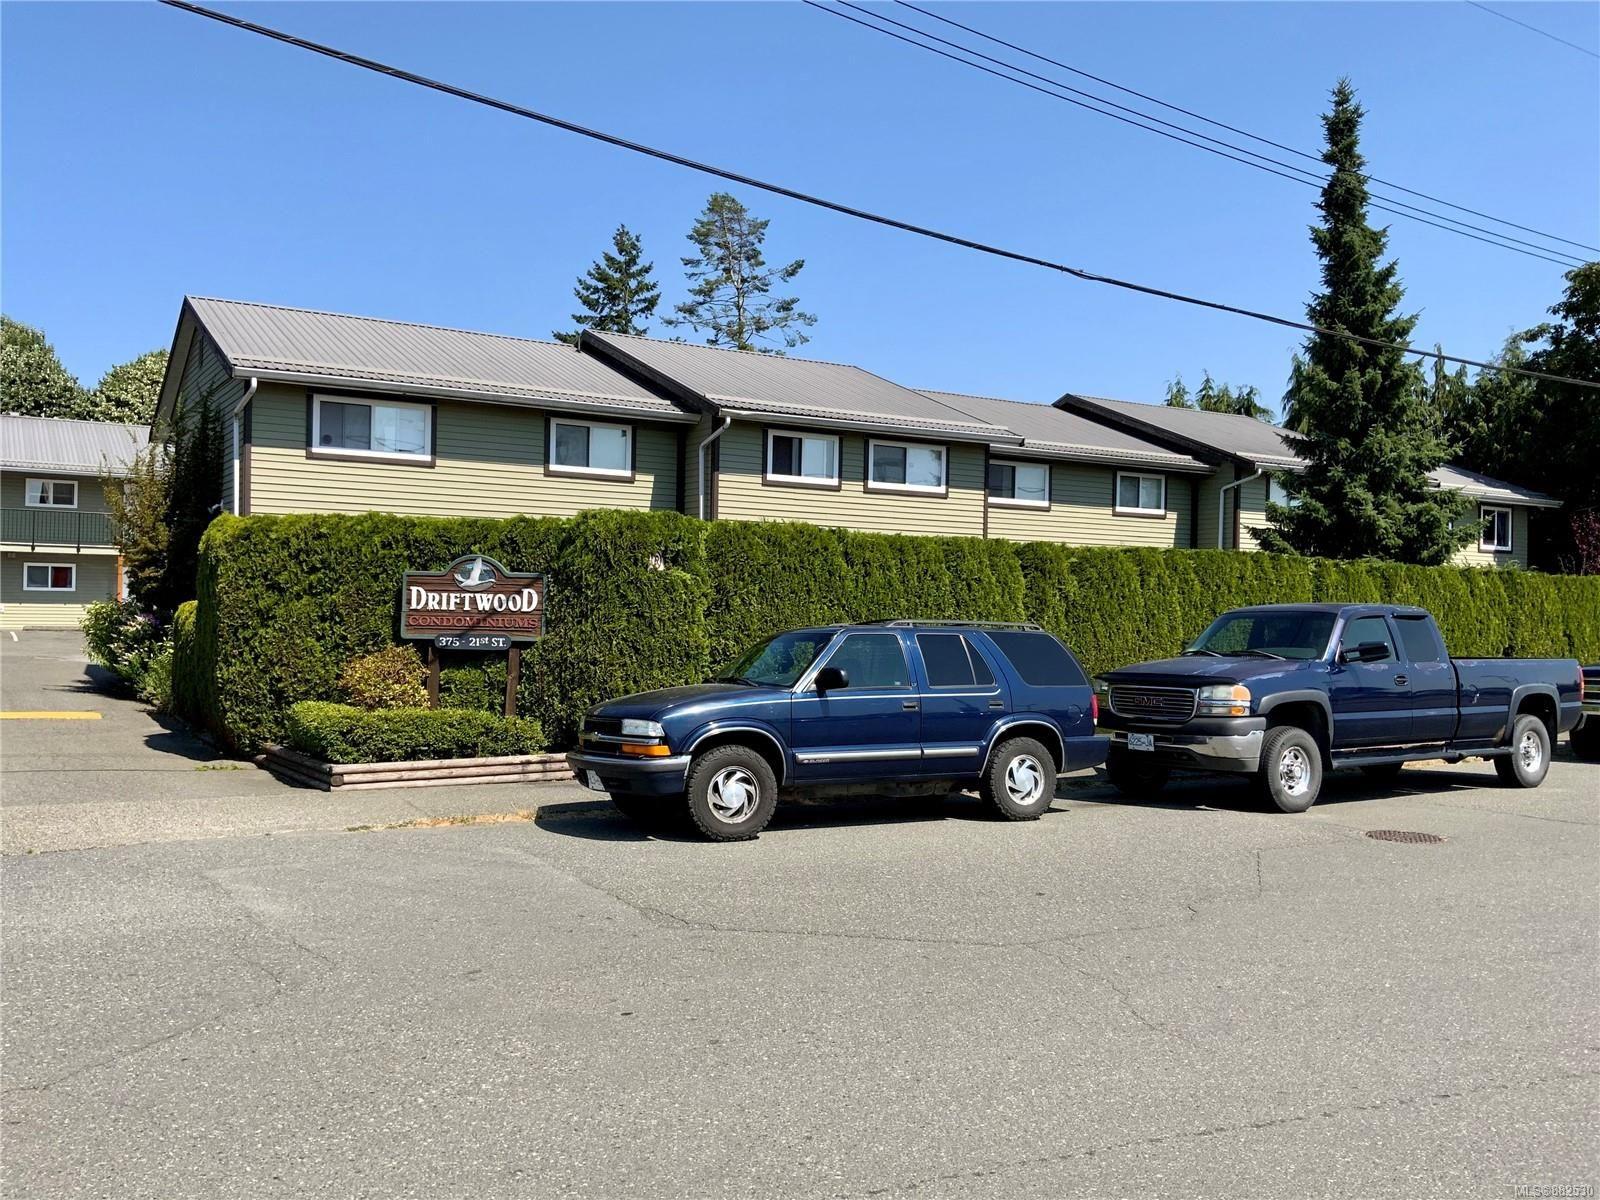 Main Photo: 7 375 21st St in : CV Courtenay City Condo for sale (Comox Valley)  : MLS®# 882530